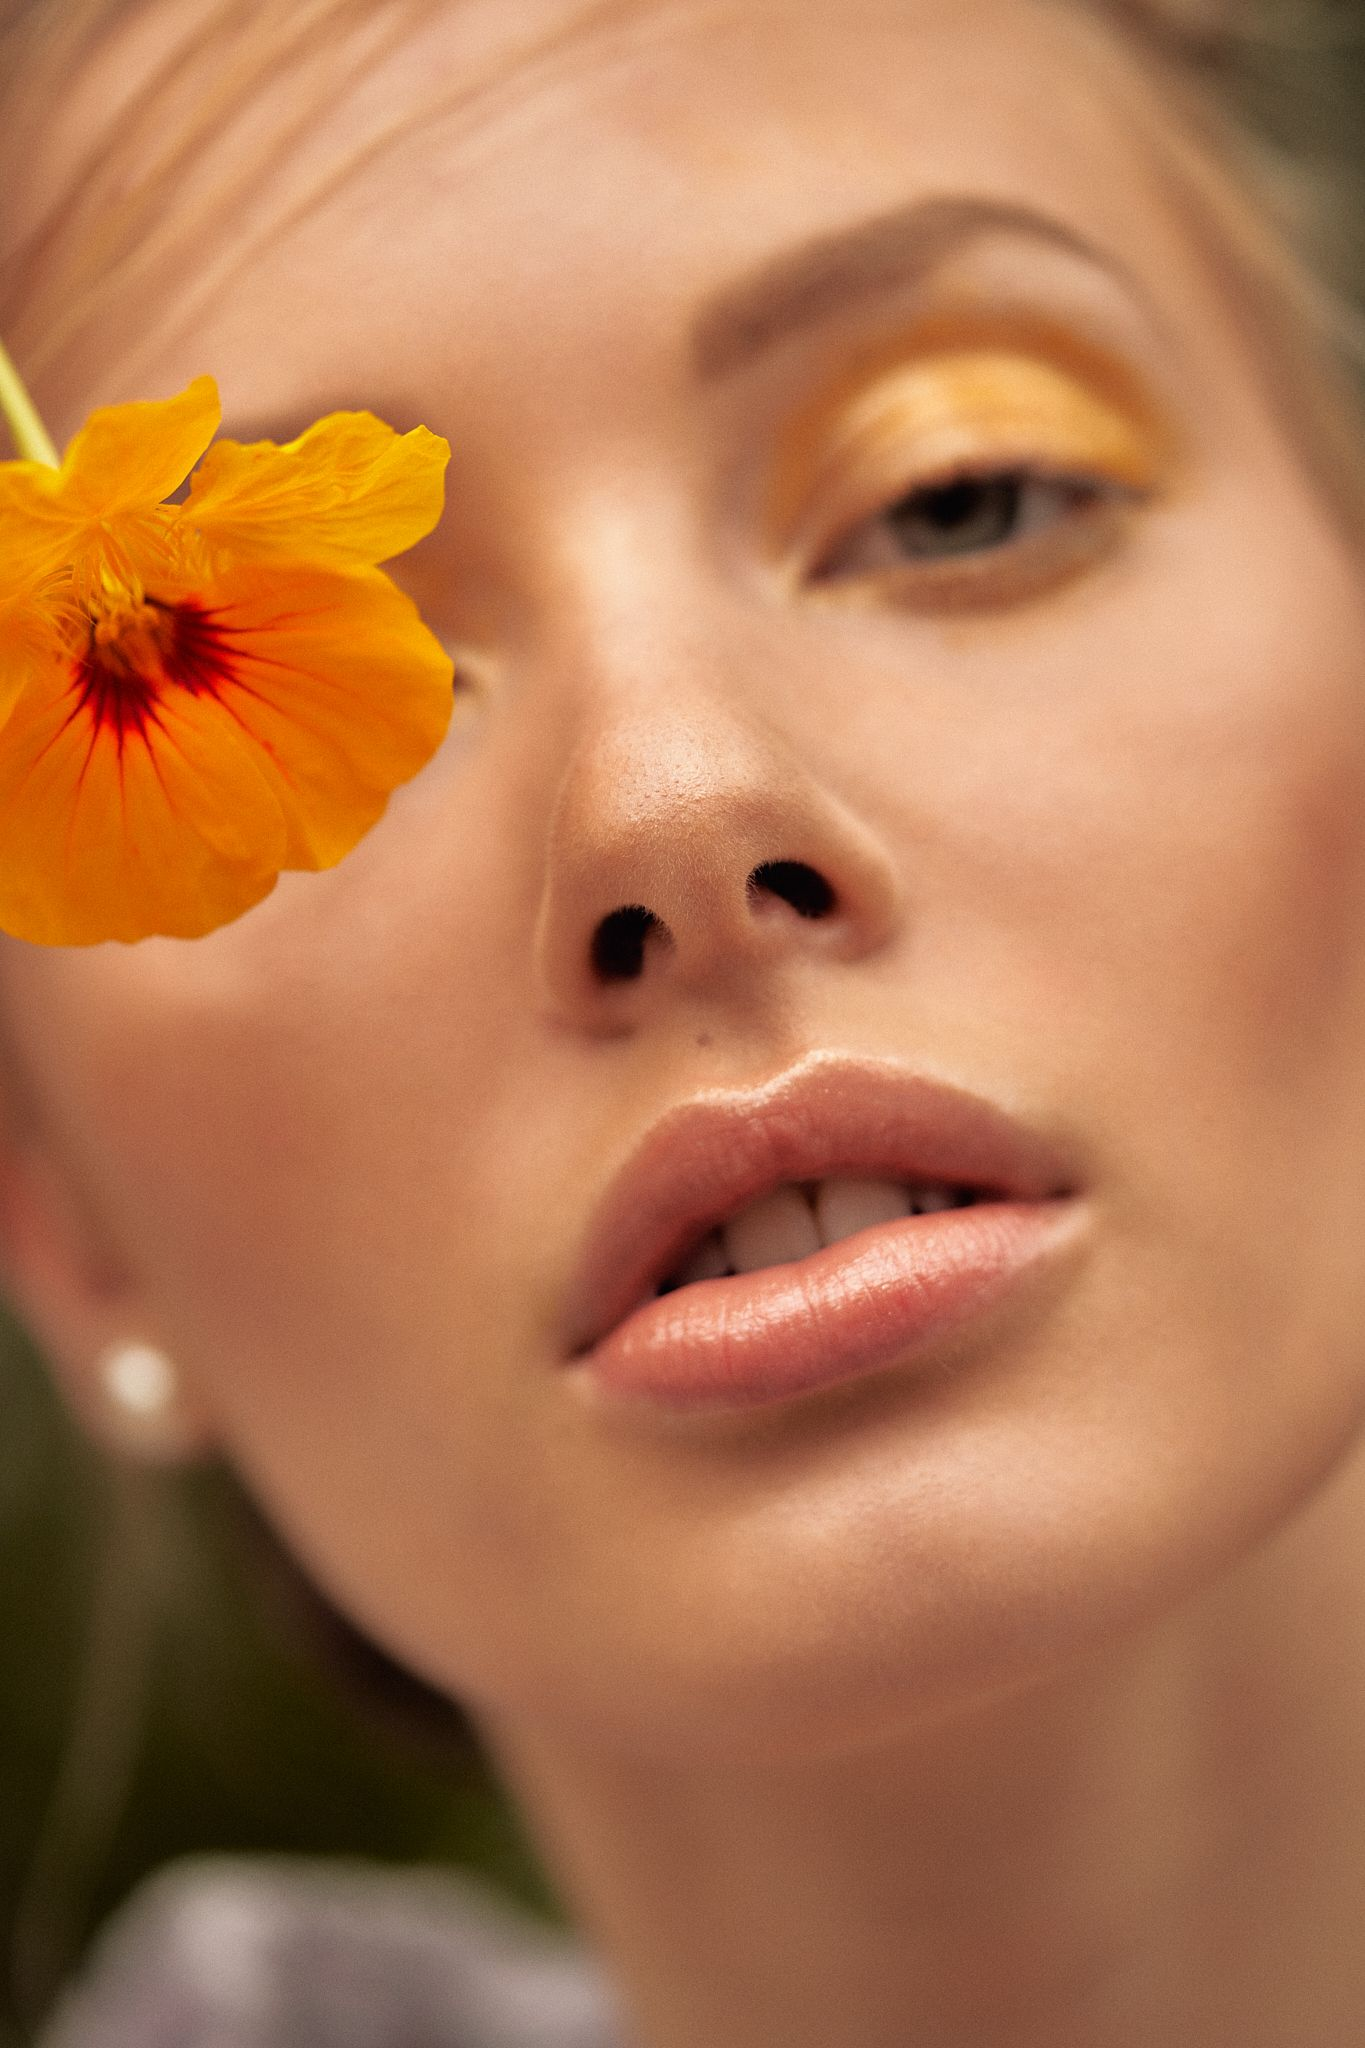 Garden of Eden -  Solstice Magazine UK - Outtakes - Pic. 9